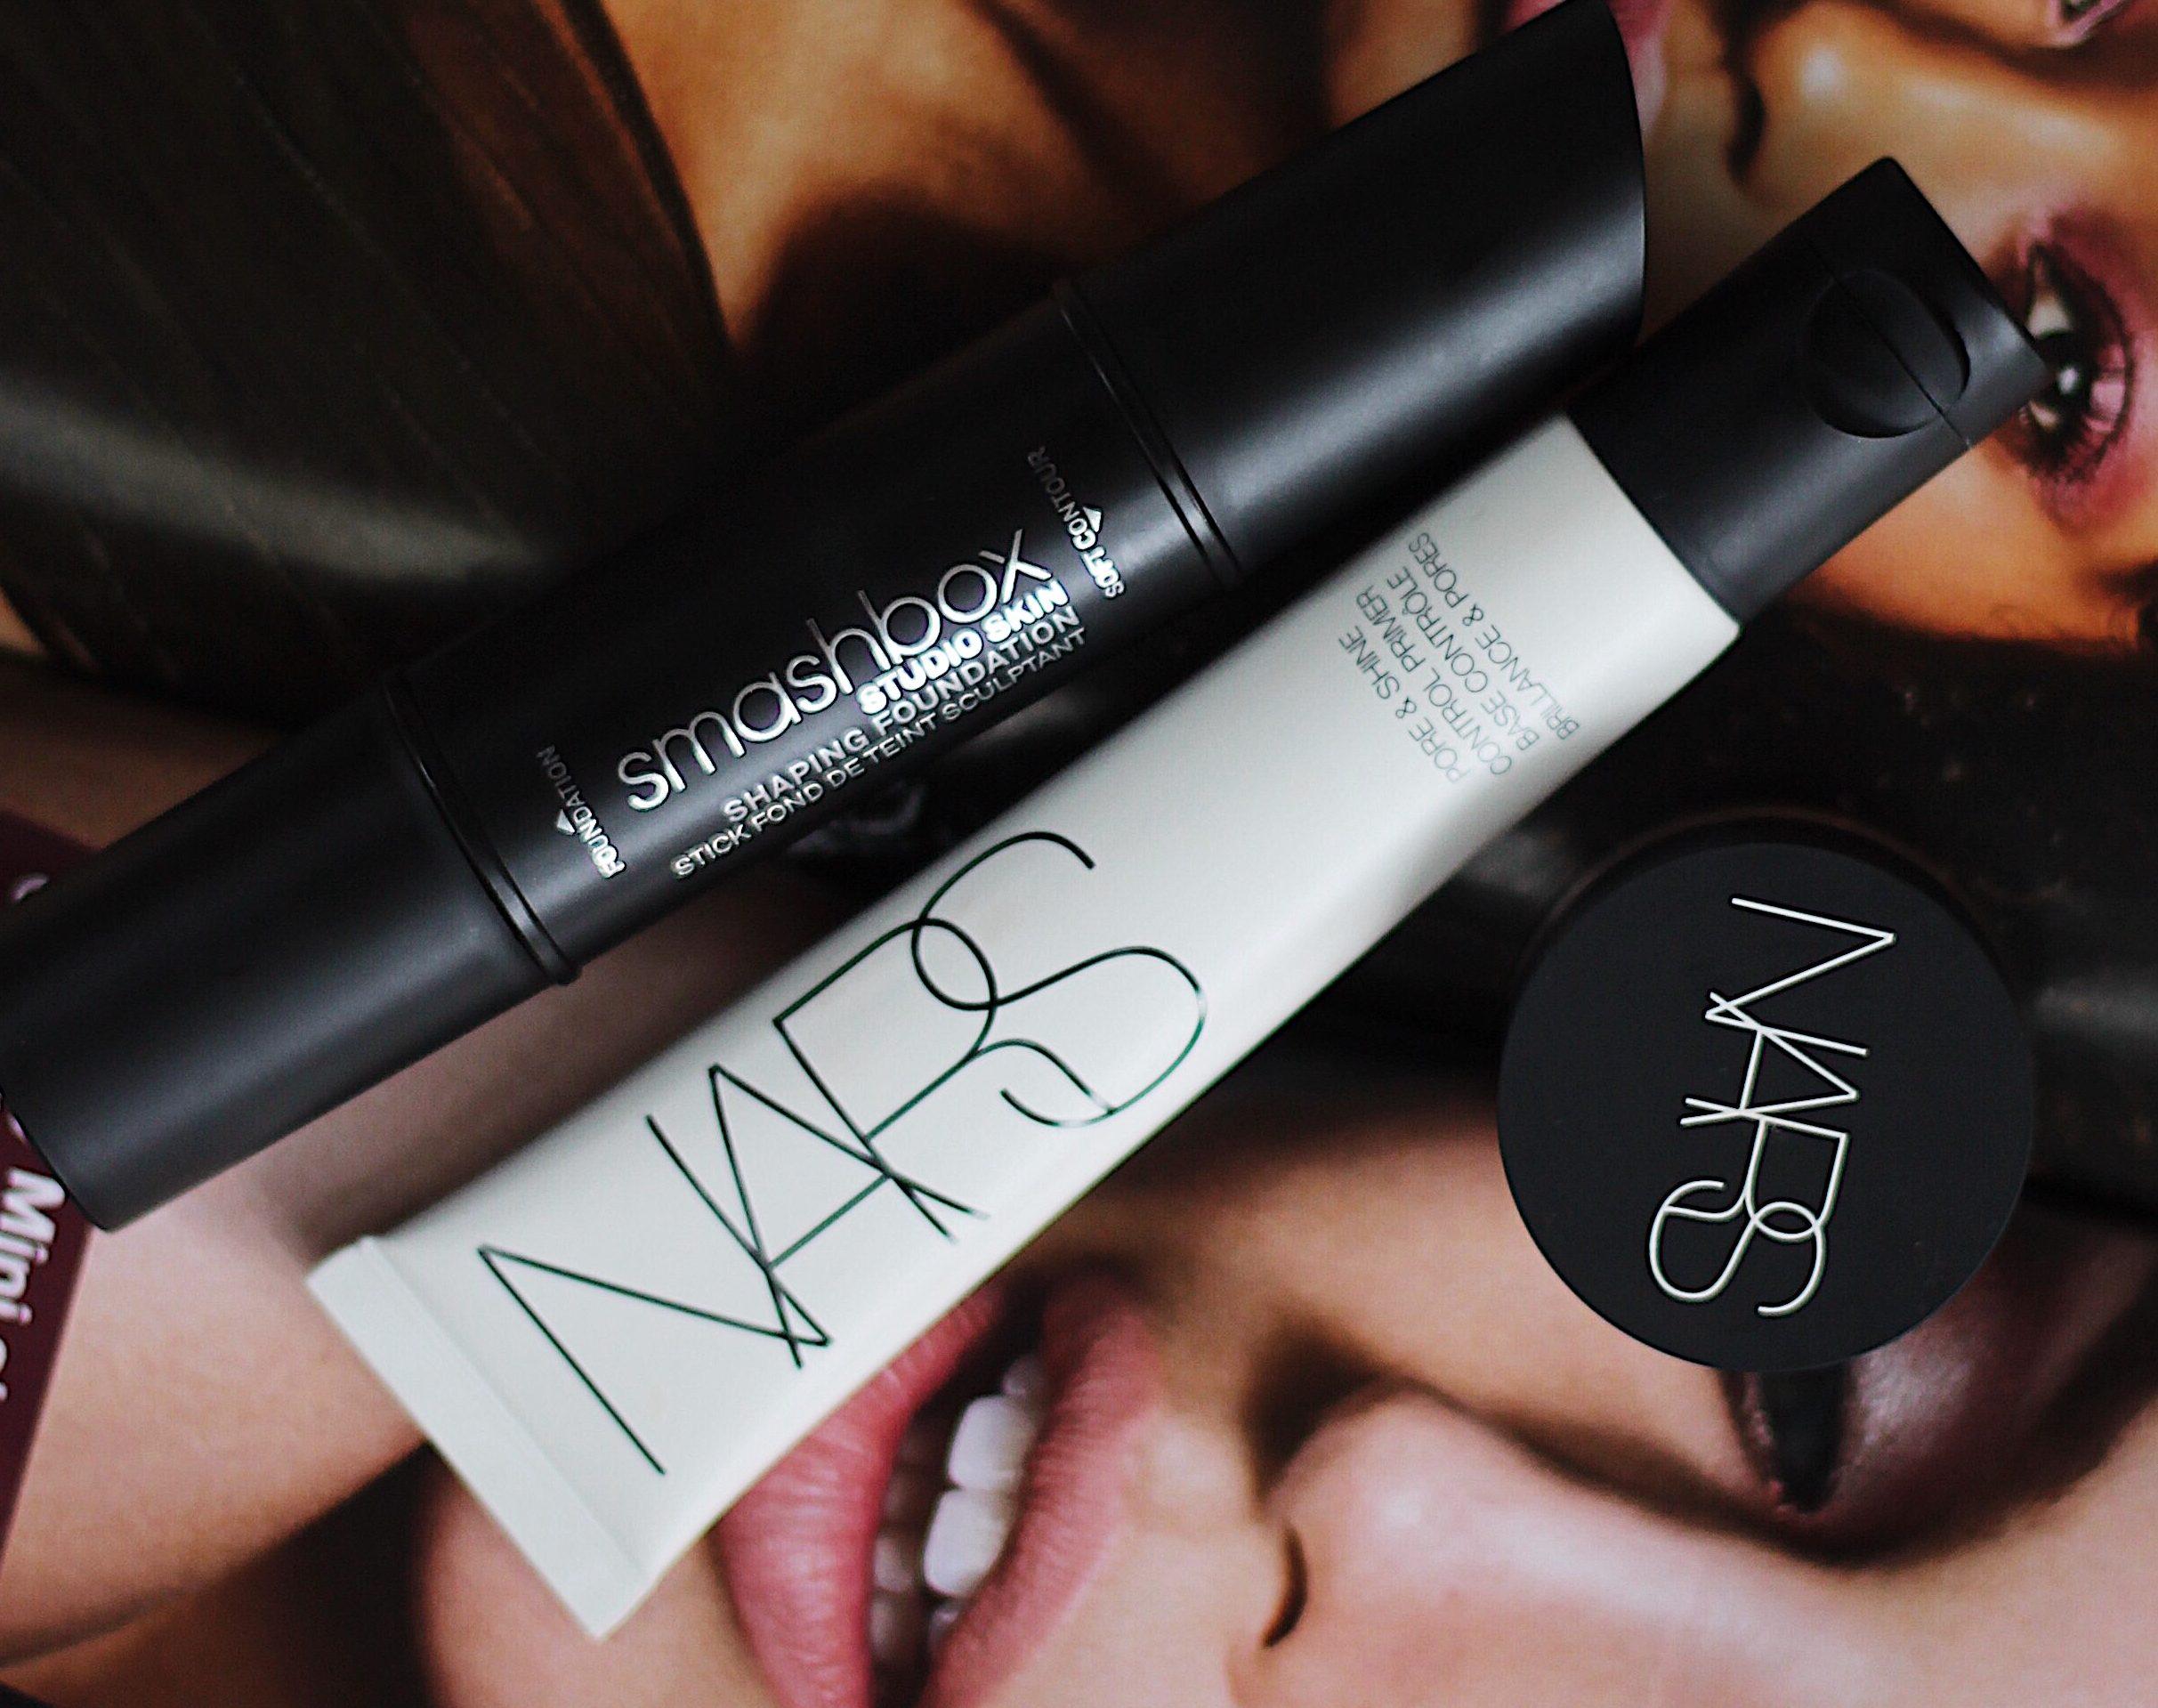 Smashbox Studio Skin Face Shaping Foundation Stick contouring dark skin 4